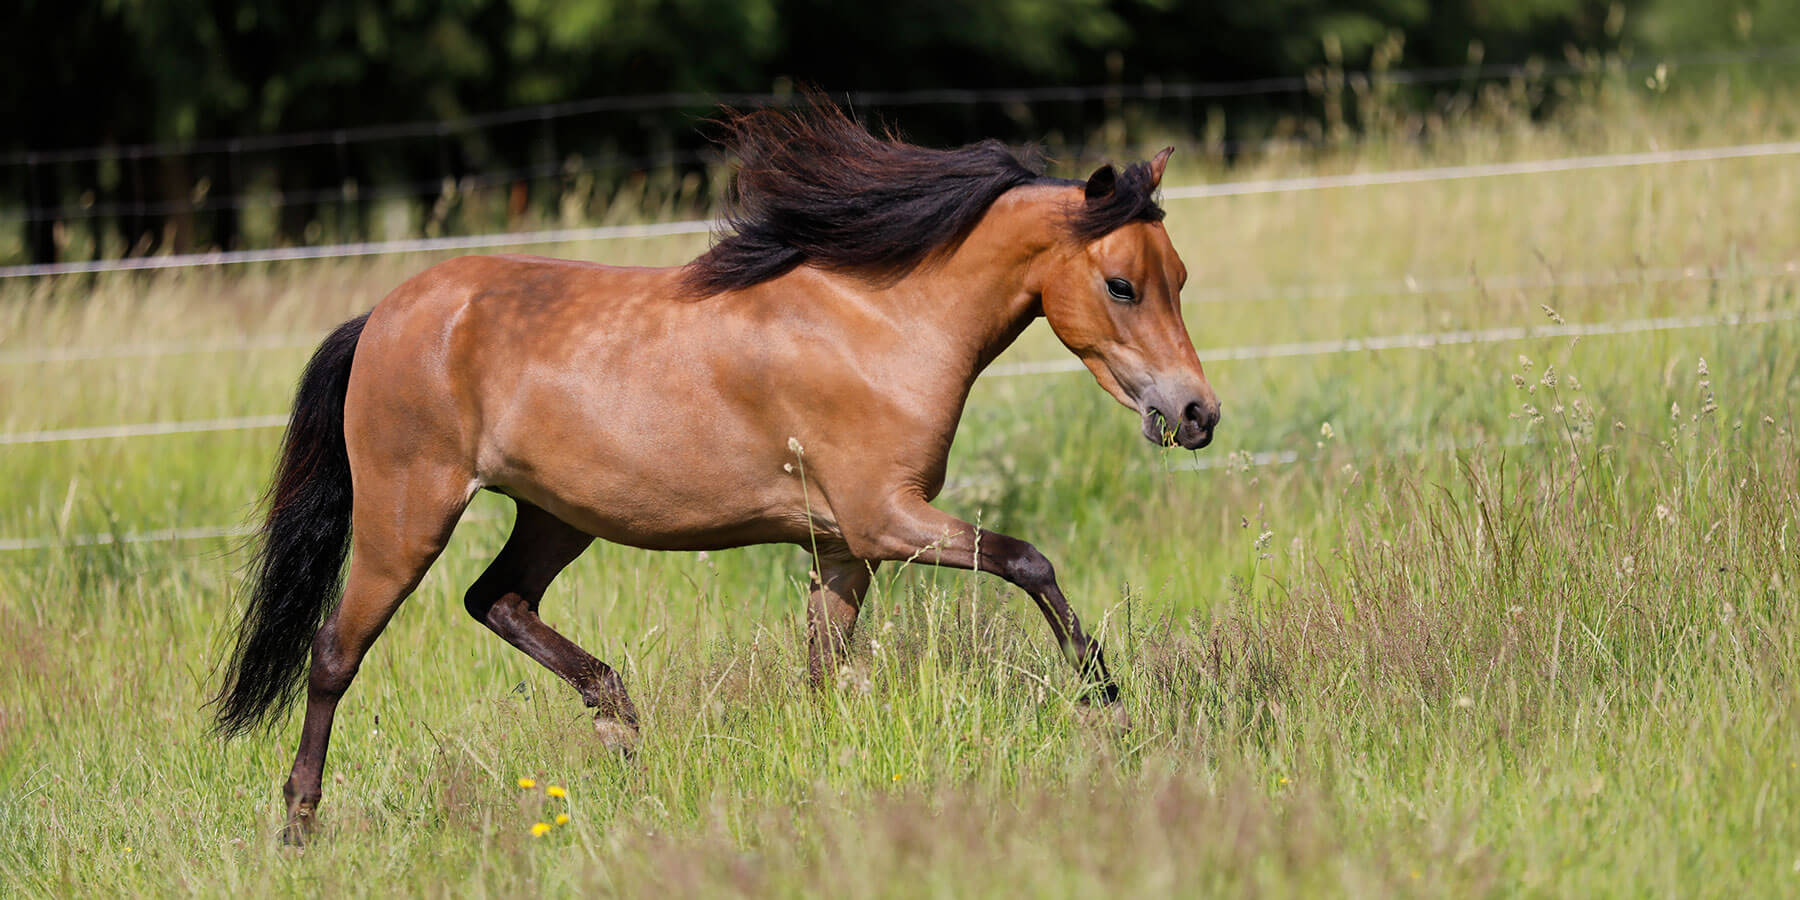 Modello STR Bailamos Firenze, American Miniature Horse